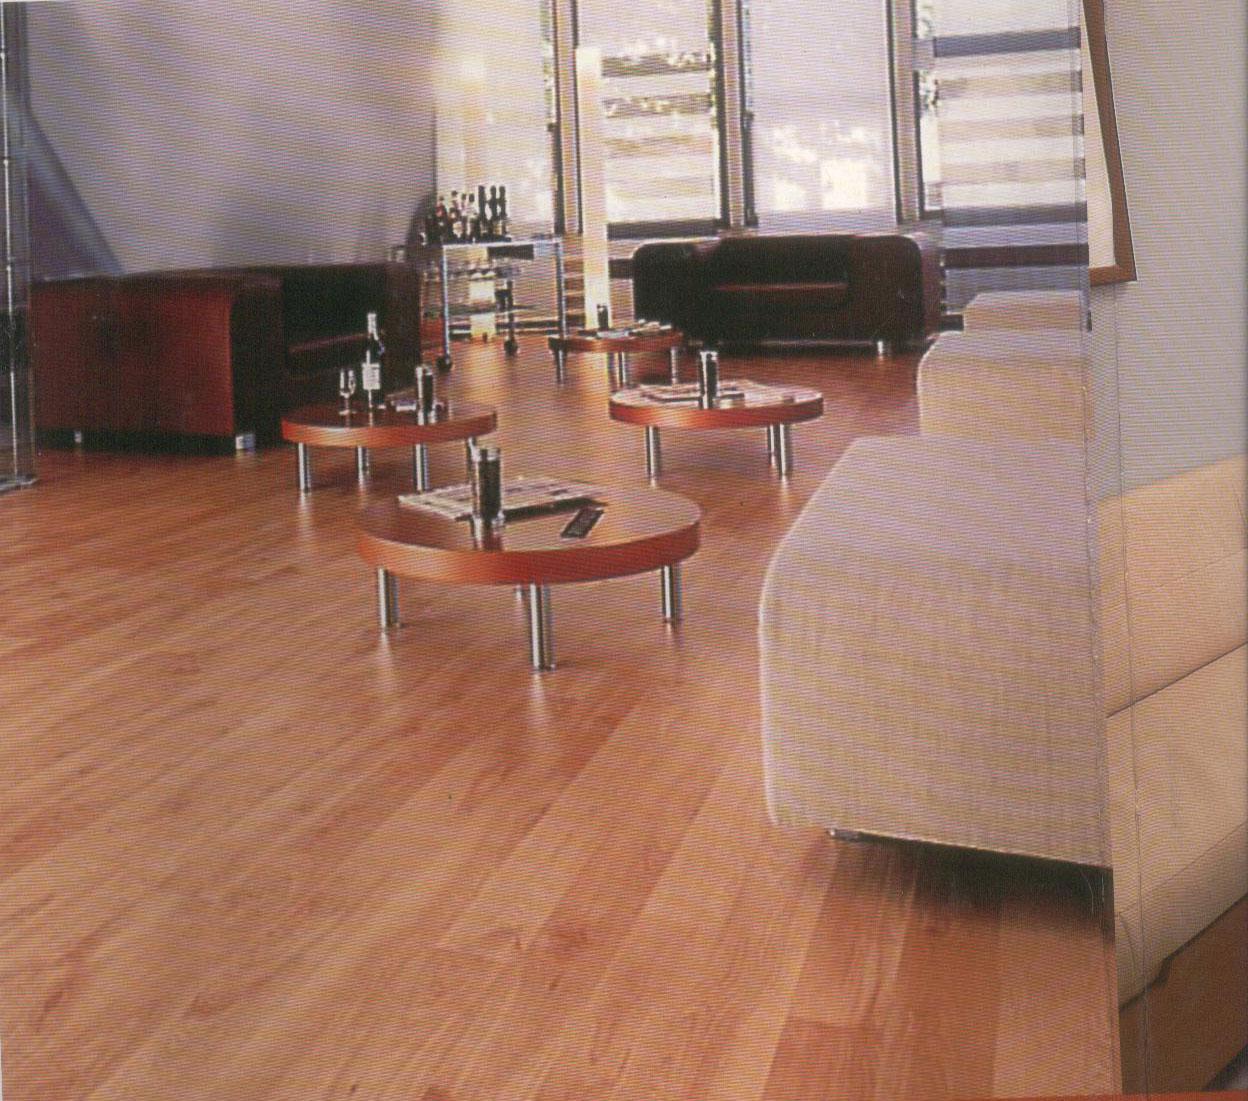 Timber Land Vinyl Plank Luxery Flooring